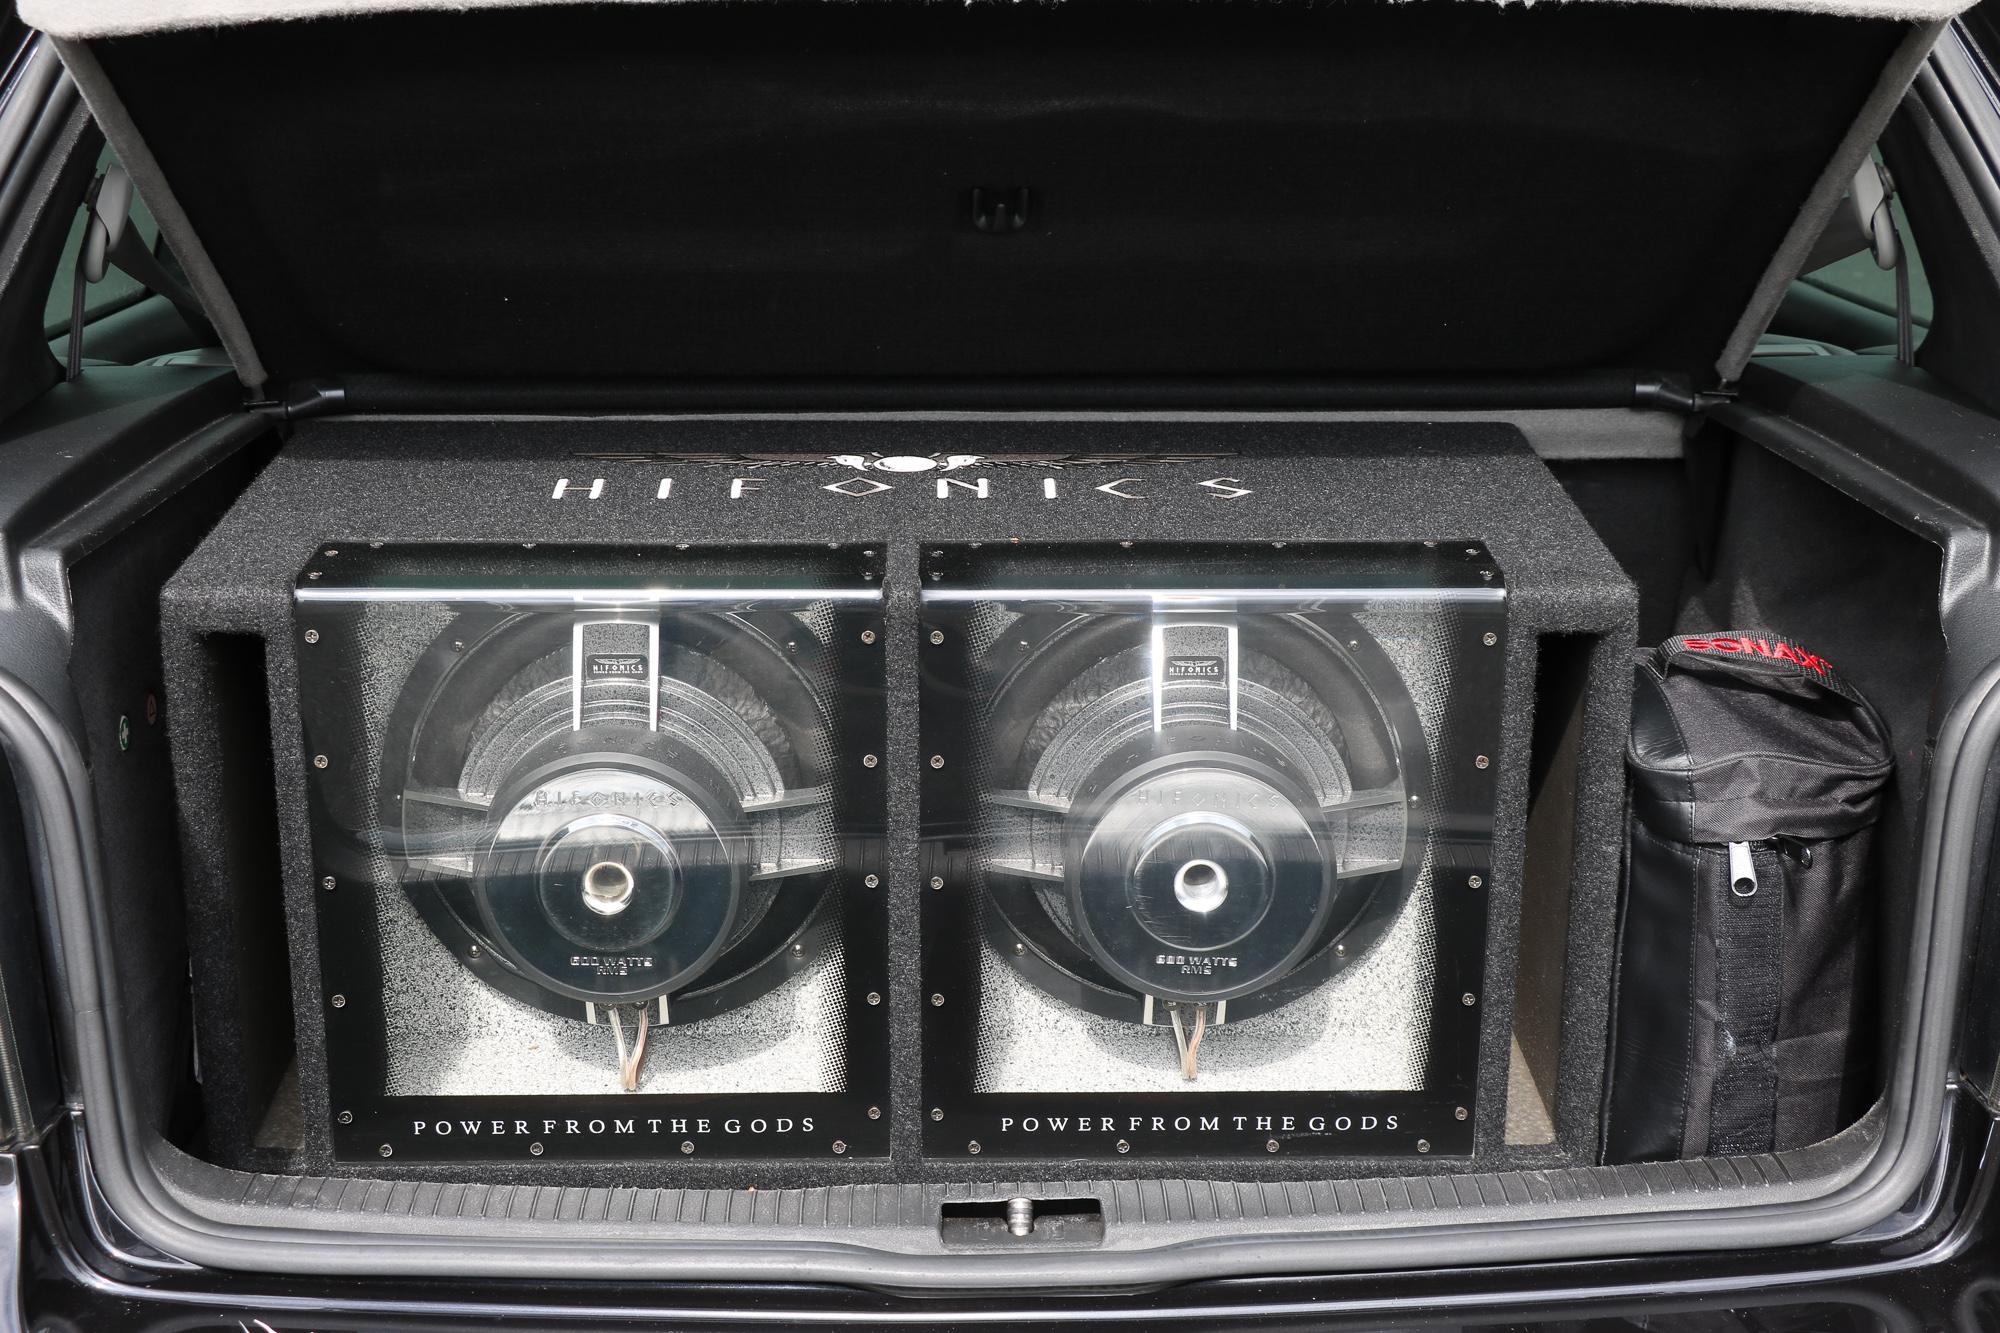 2002 VW Golf 4 R32 – Ausfahrt TV Tuning S01 E09